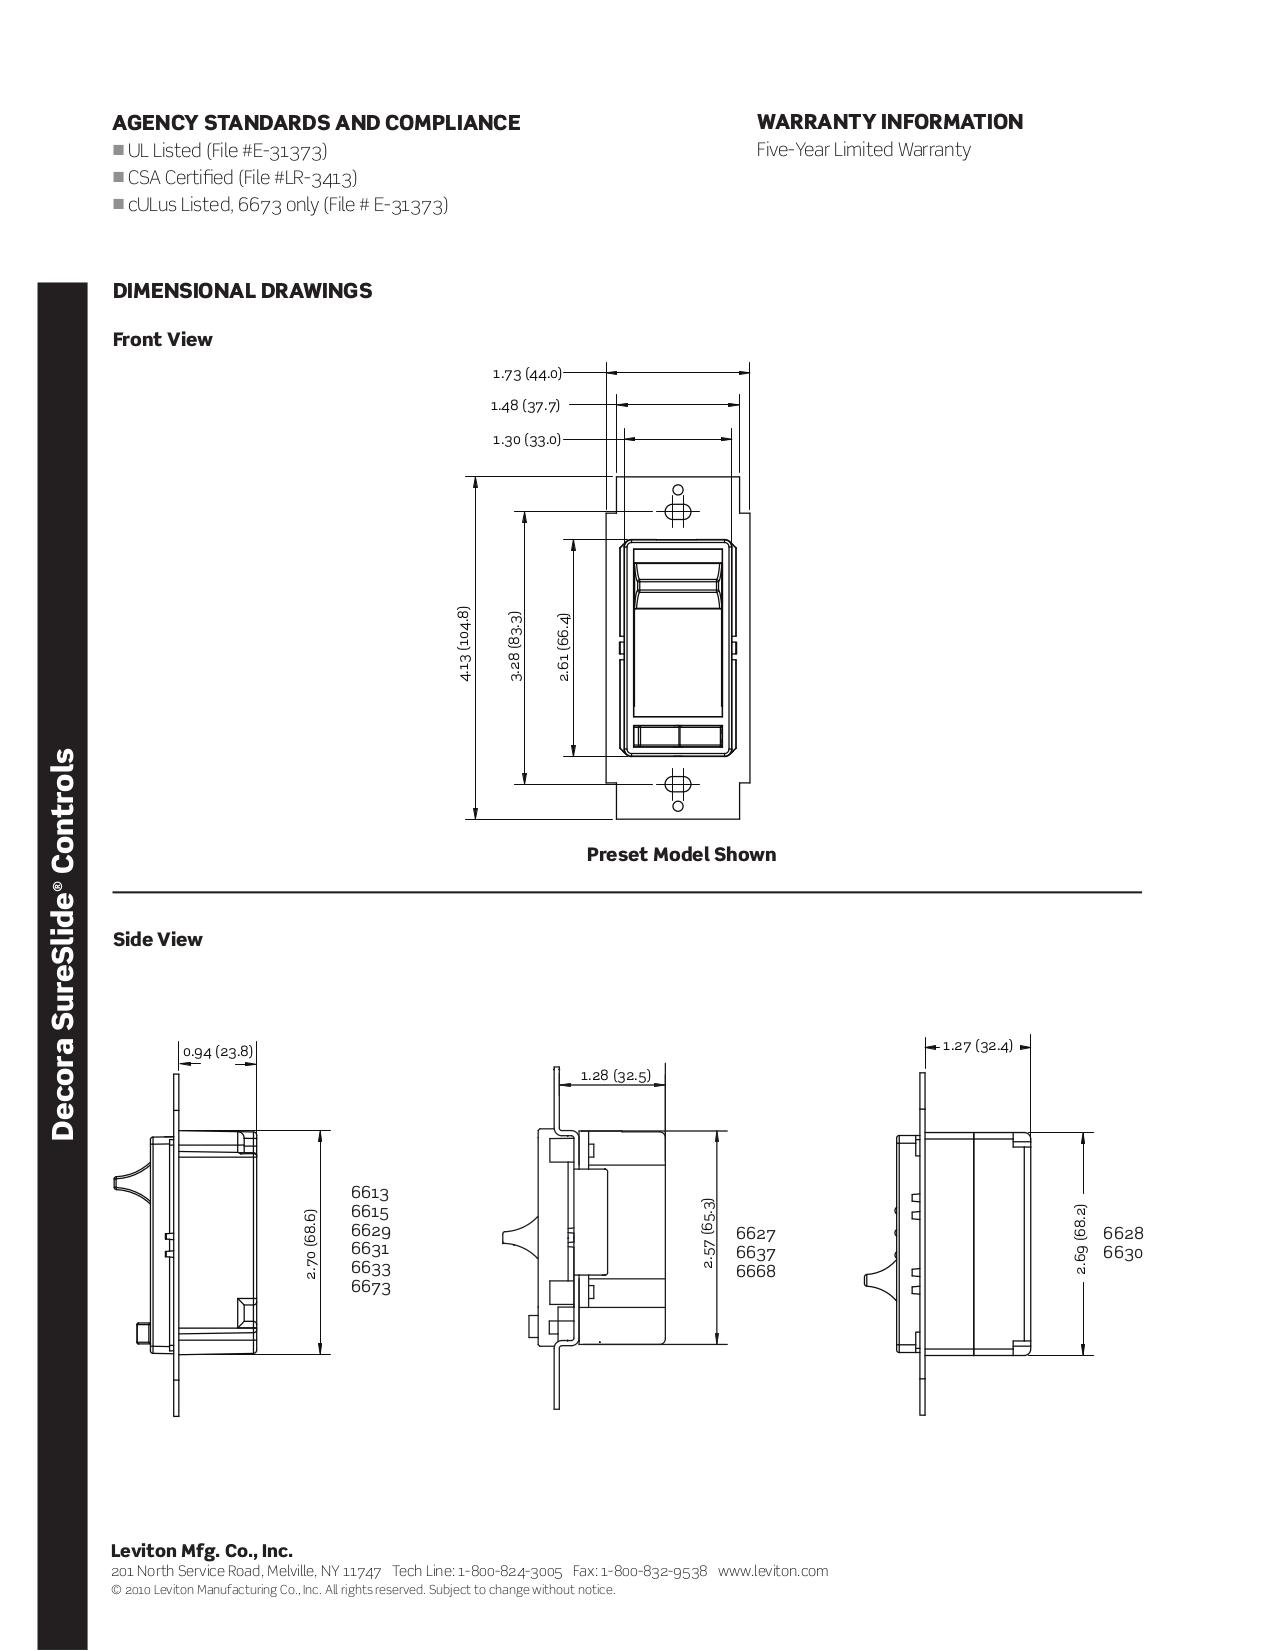 Kawasaki Vulcan 1500 Clic Wiring Diagram Simple Wiring ... on kawasaki 1500 fuel system, kawasaki nomad wiring diagram, kawasaki 1500 parts, kawasaki 1500 accessories, kawasaki mean streak, kawasaki vulcan wiring diagram,